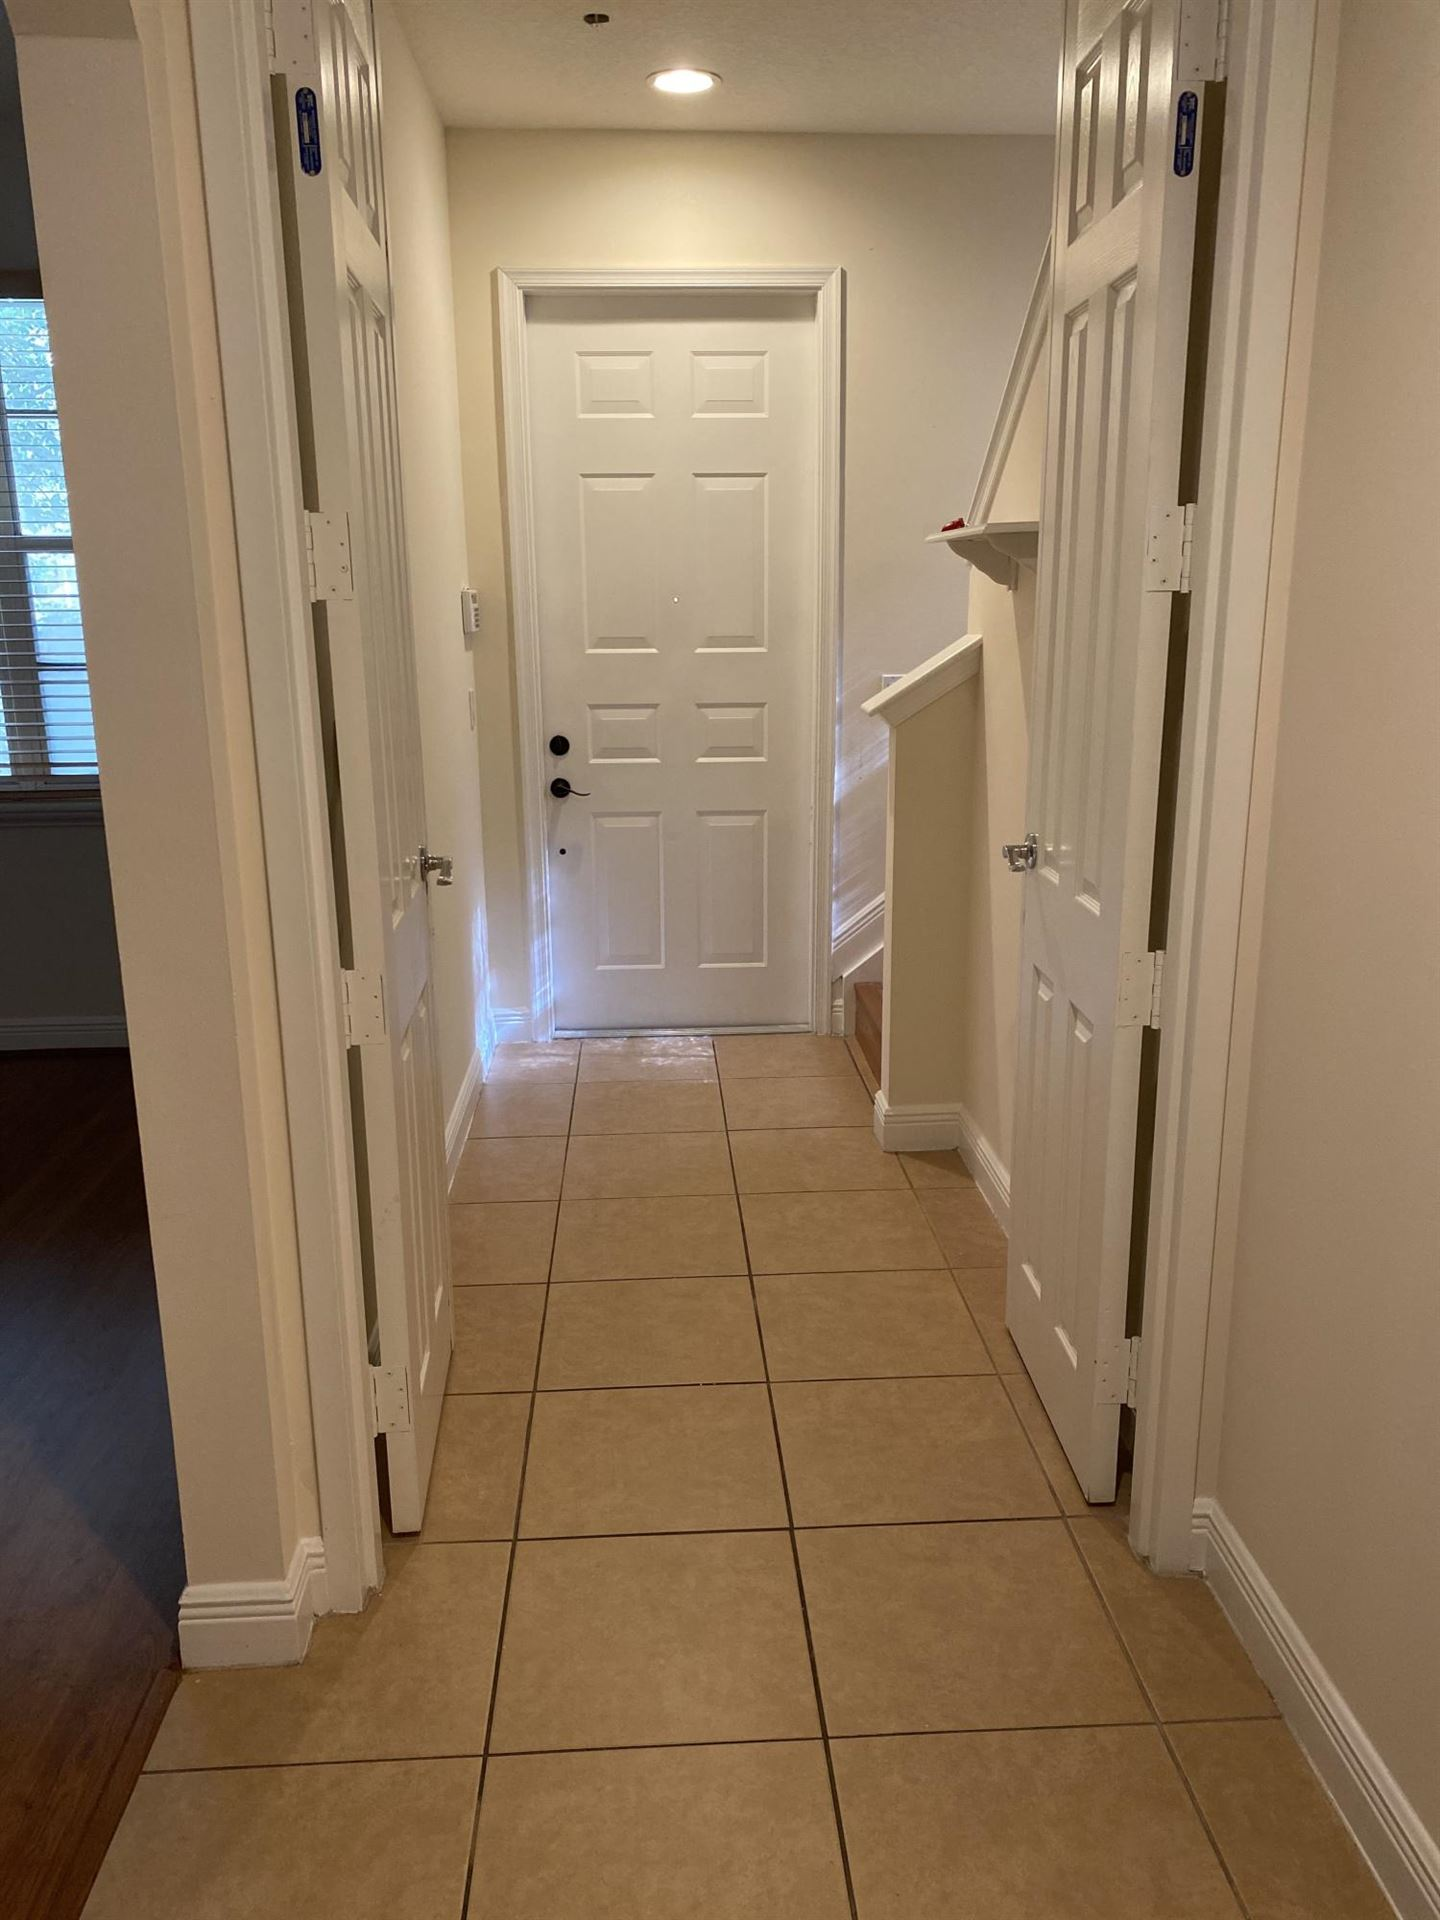 Photo of 124 Powell Lane, Jupiter, FL 33458 (MLS # RX-10650877)